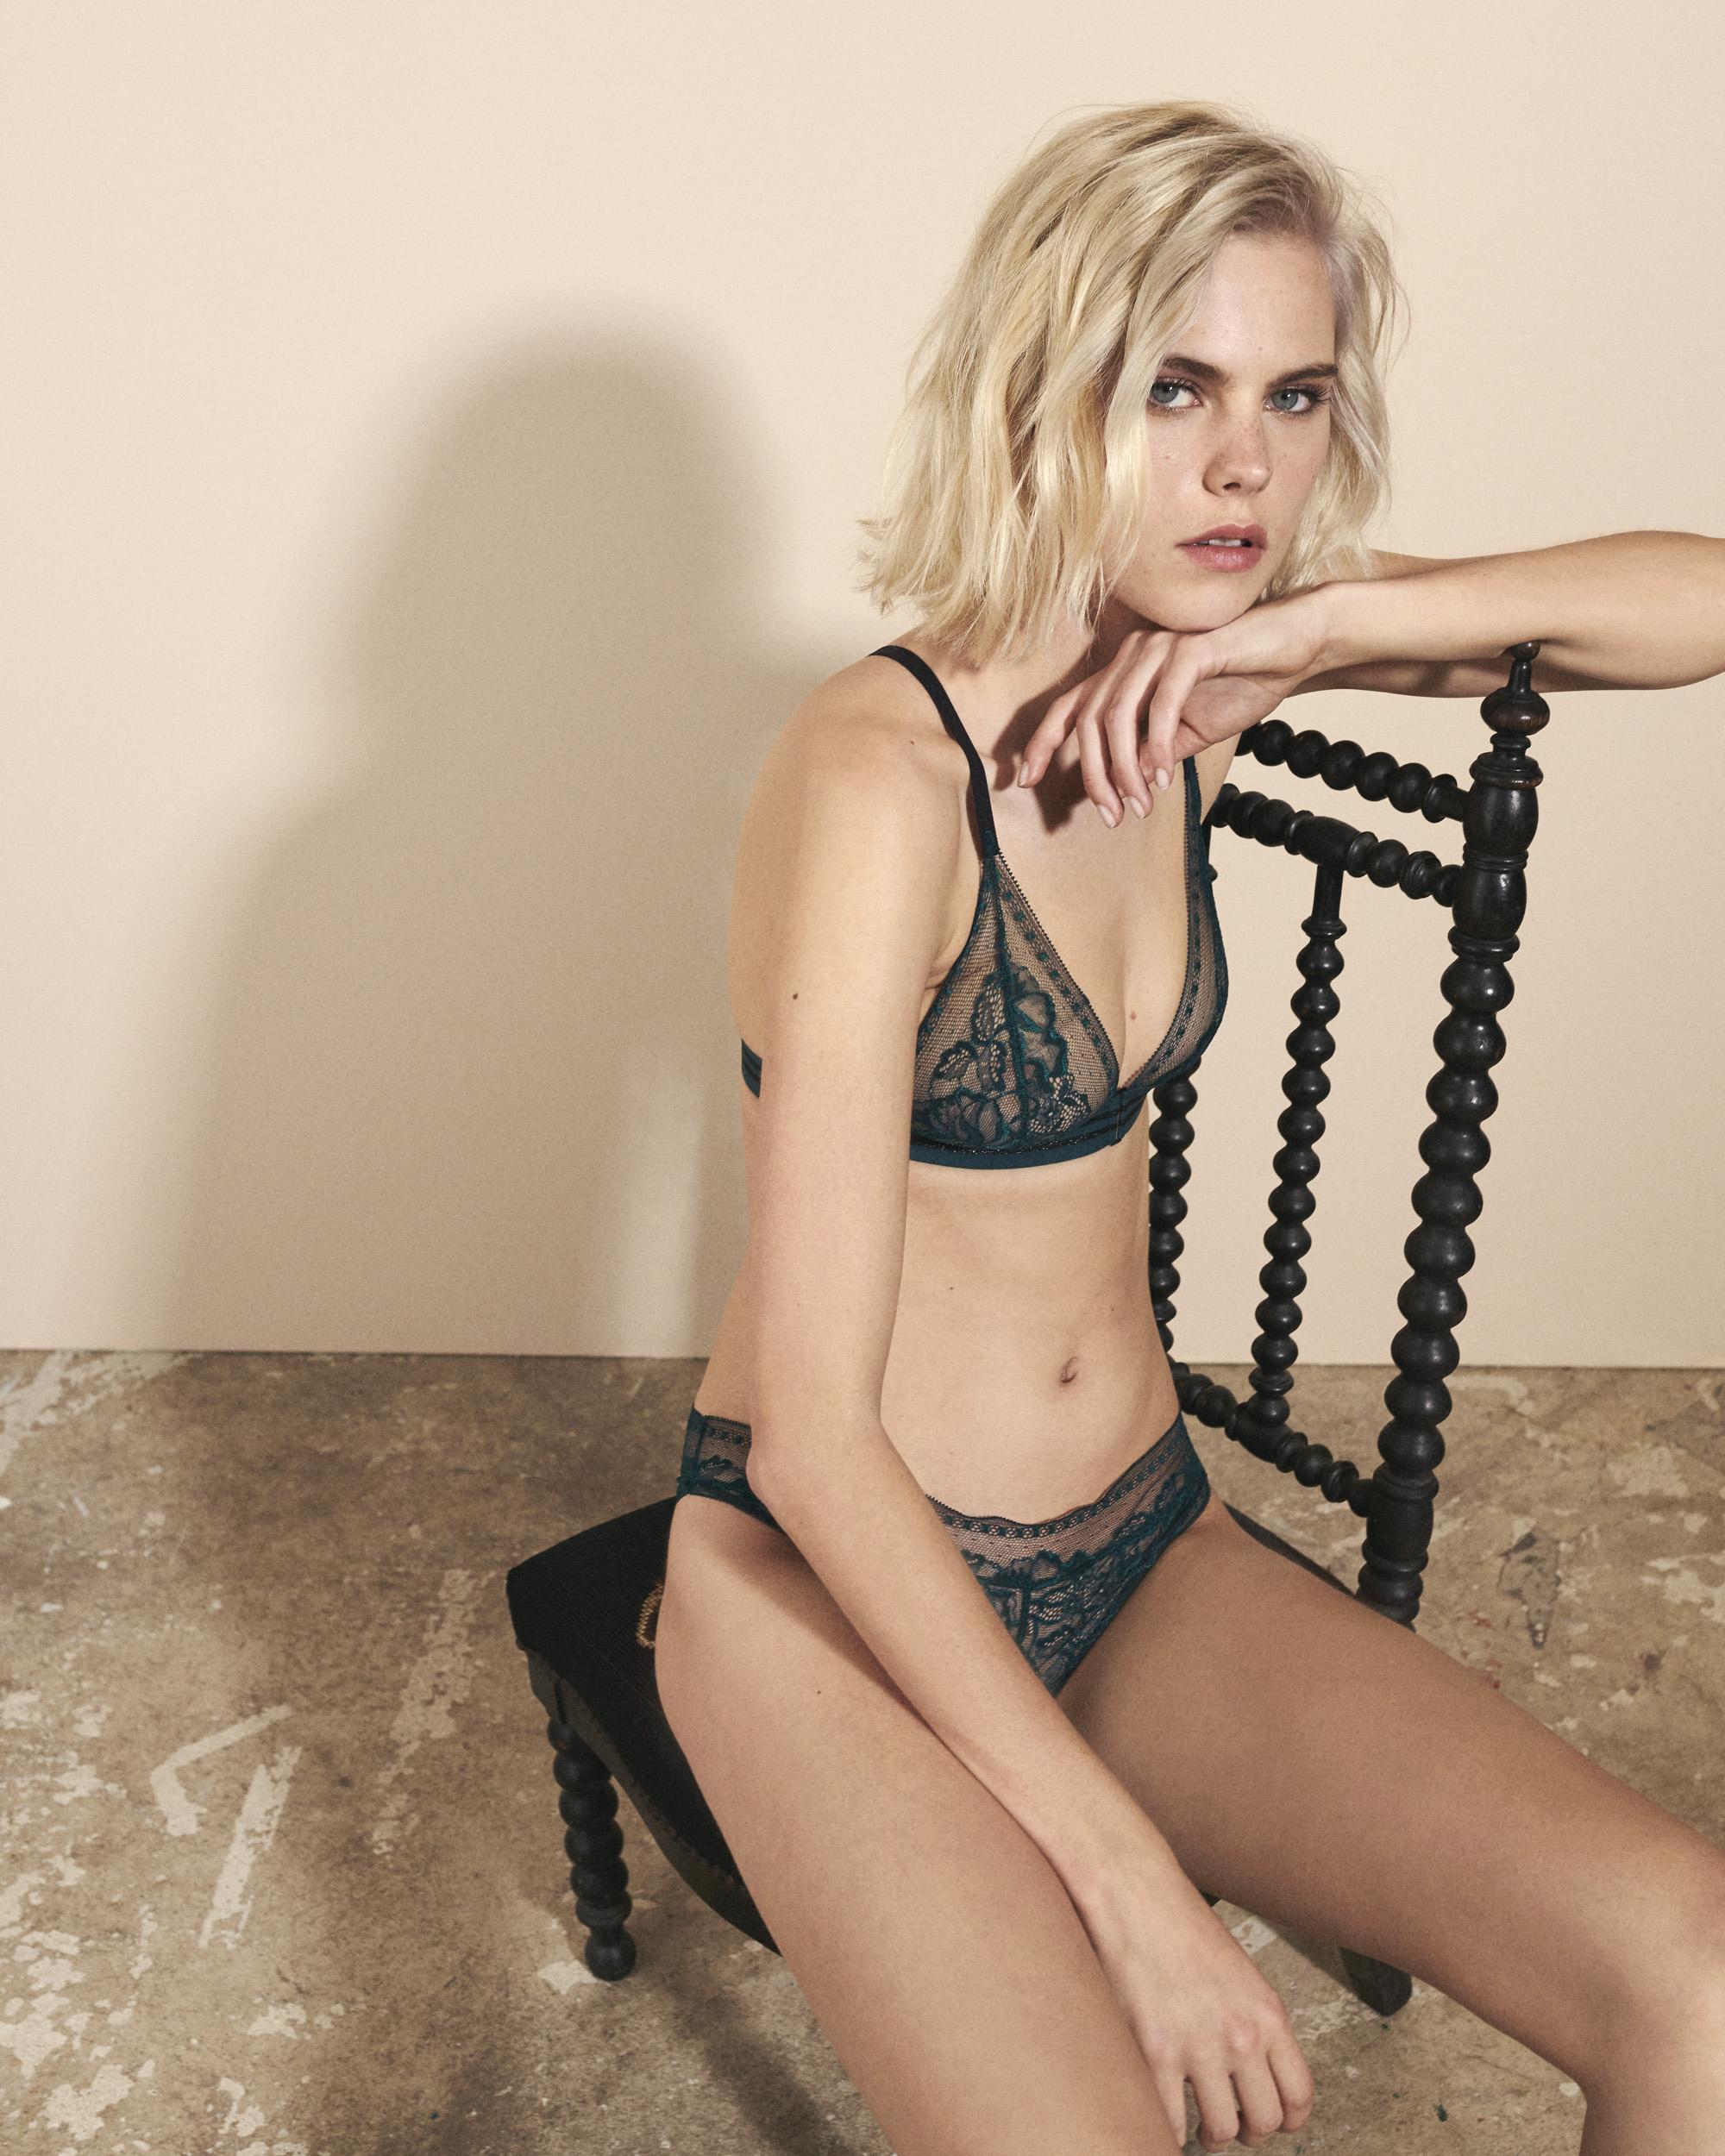 French lingerie brand Livy